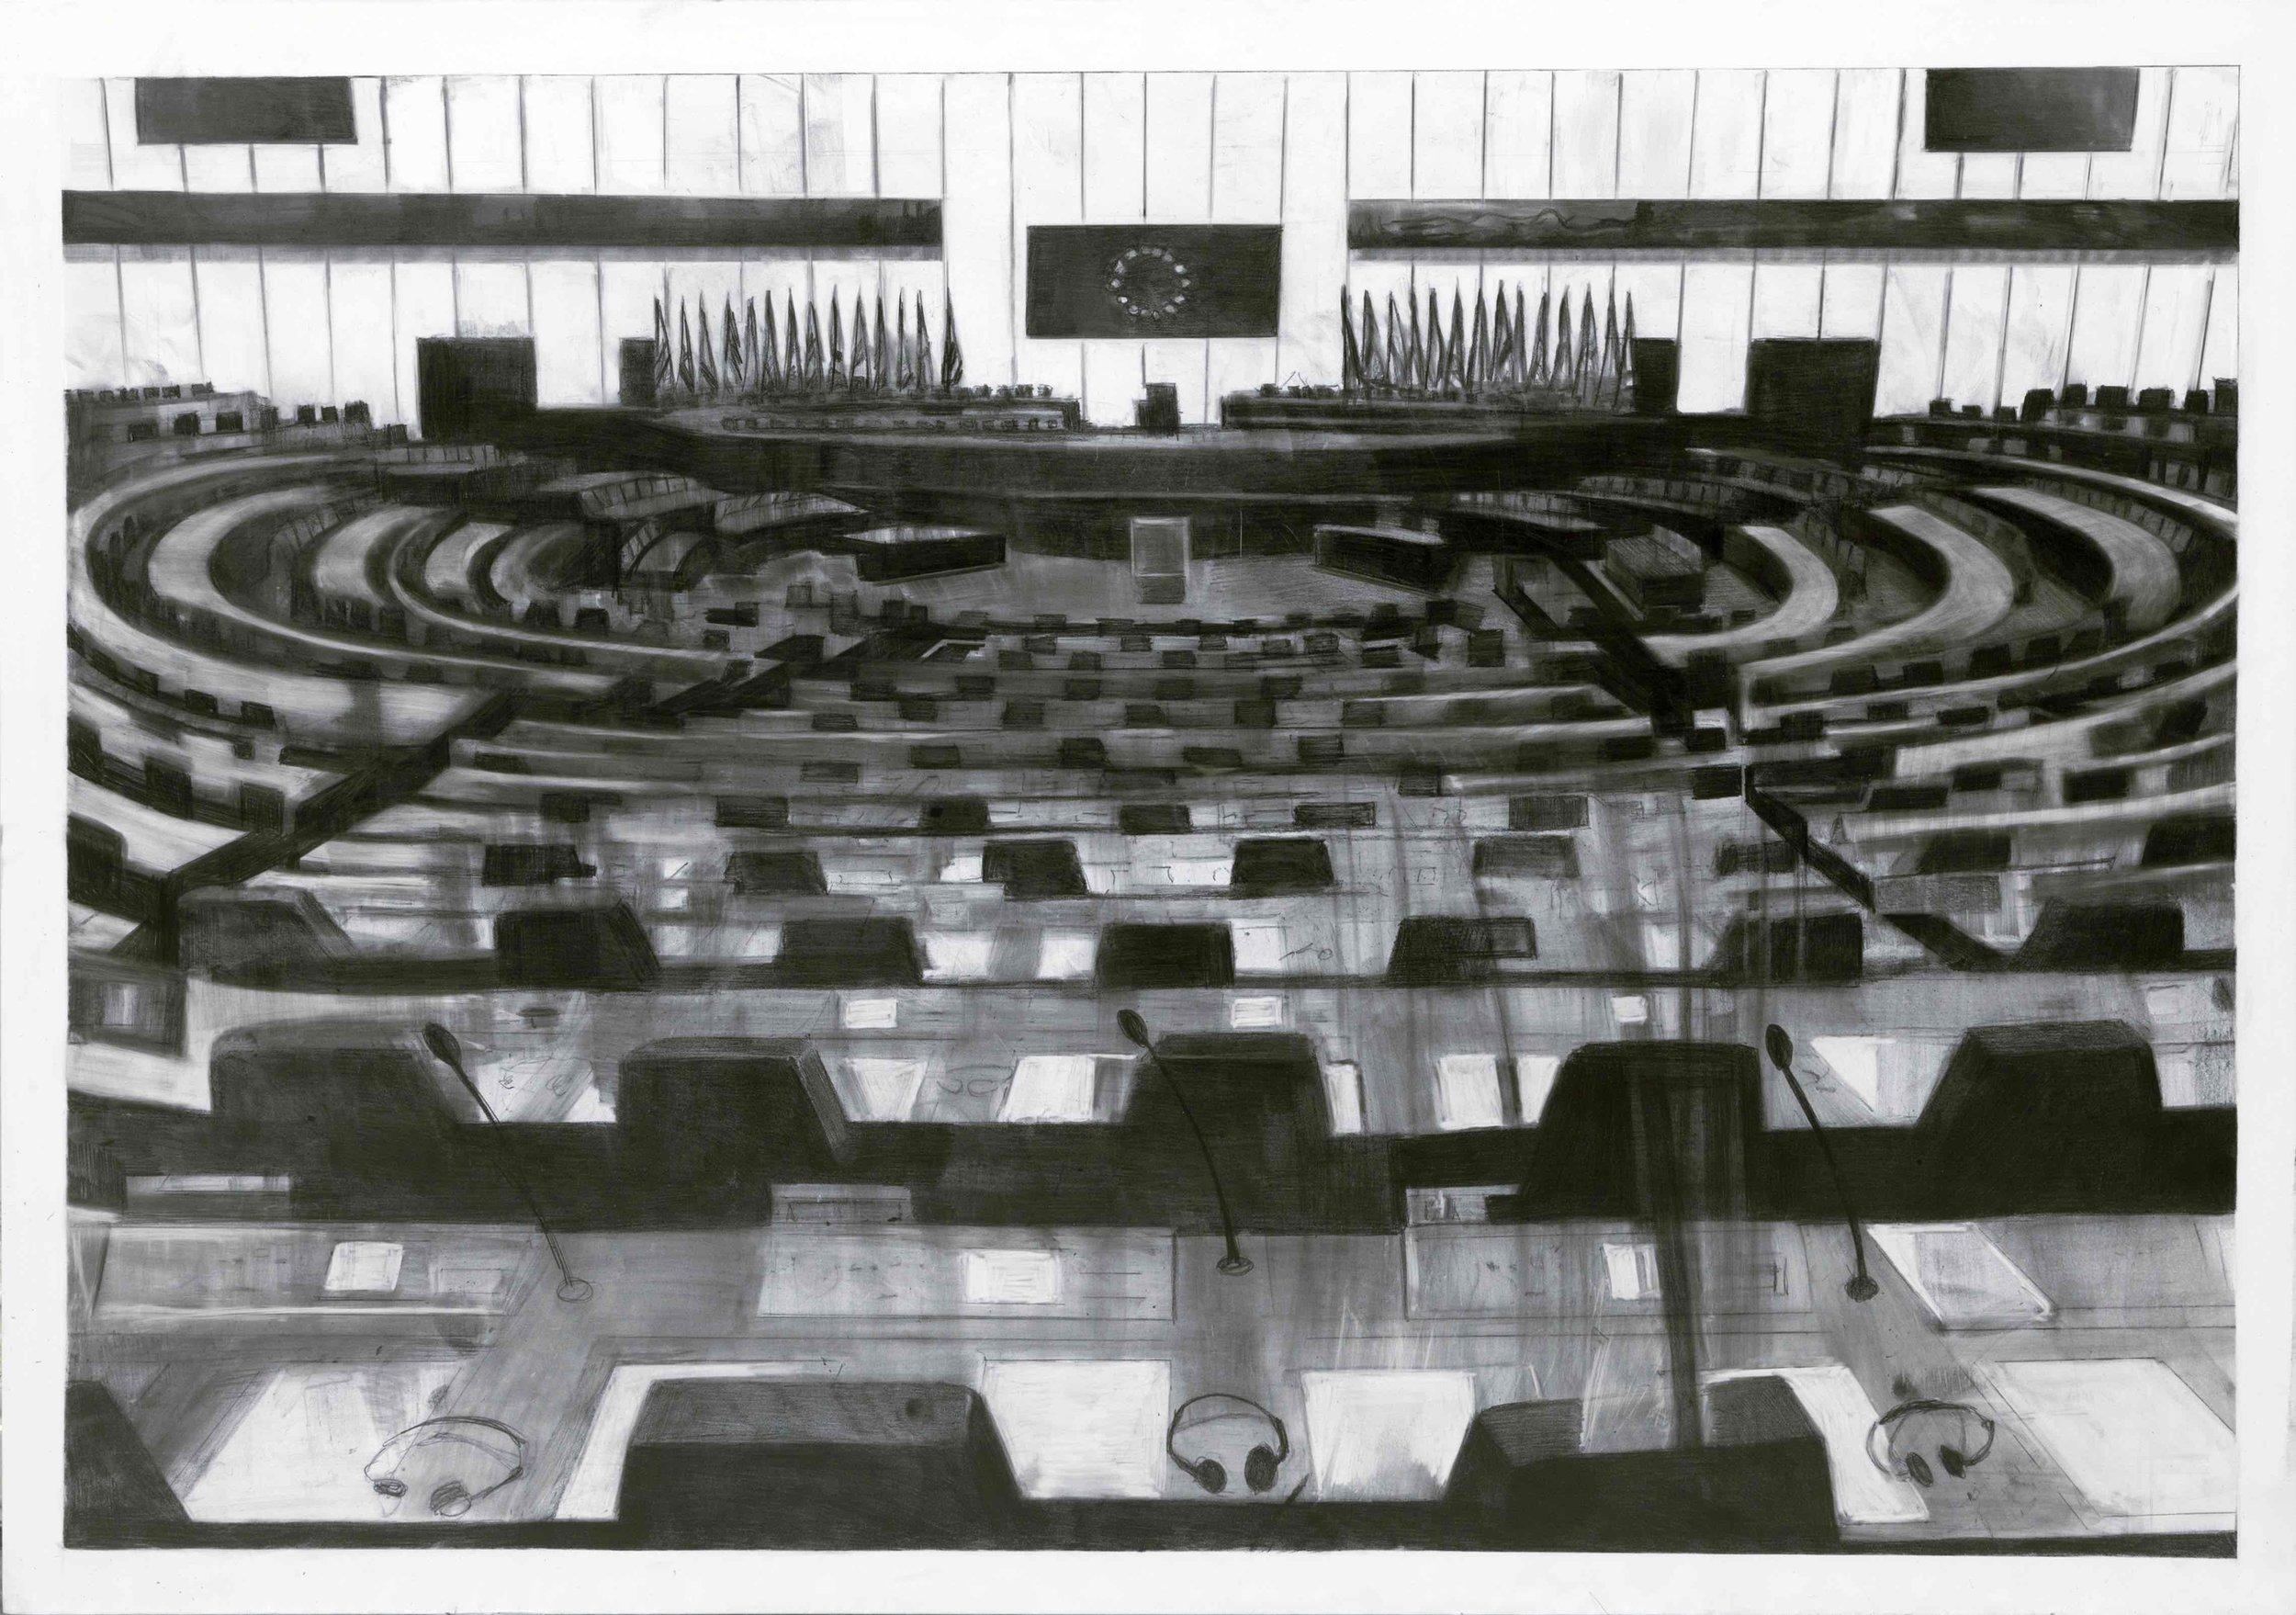 Marc Bauer –Untitled, European Parliament, 2019. Pencil on coated aluminium board (Dibond), 45 x 64 cm